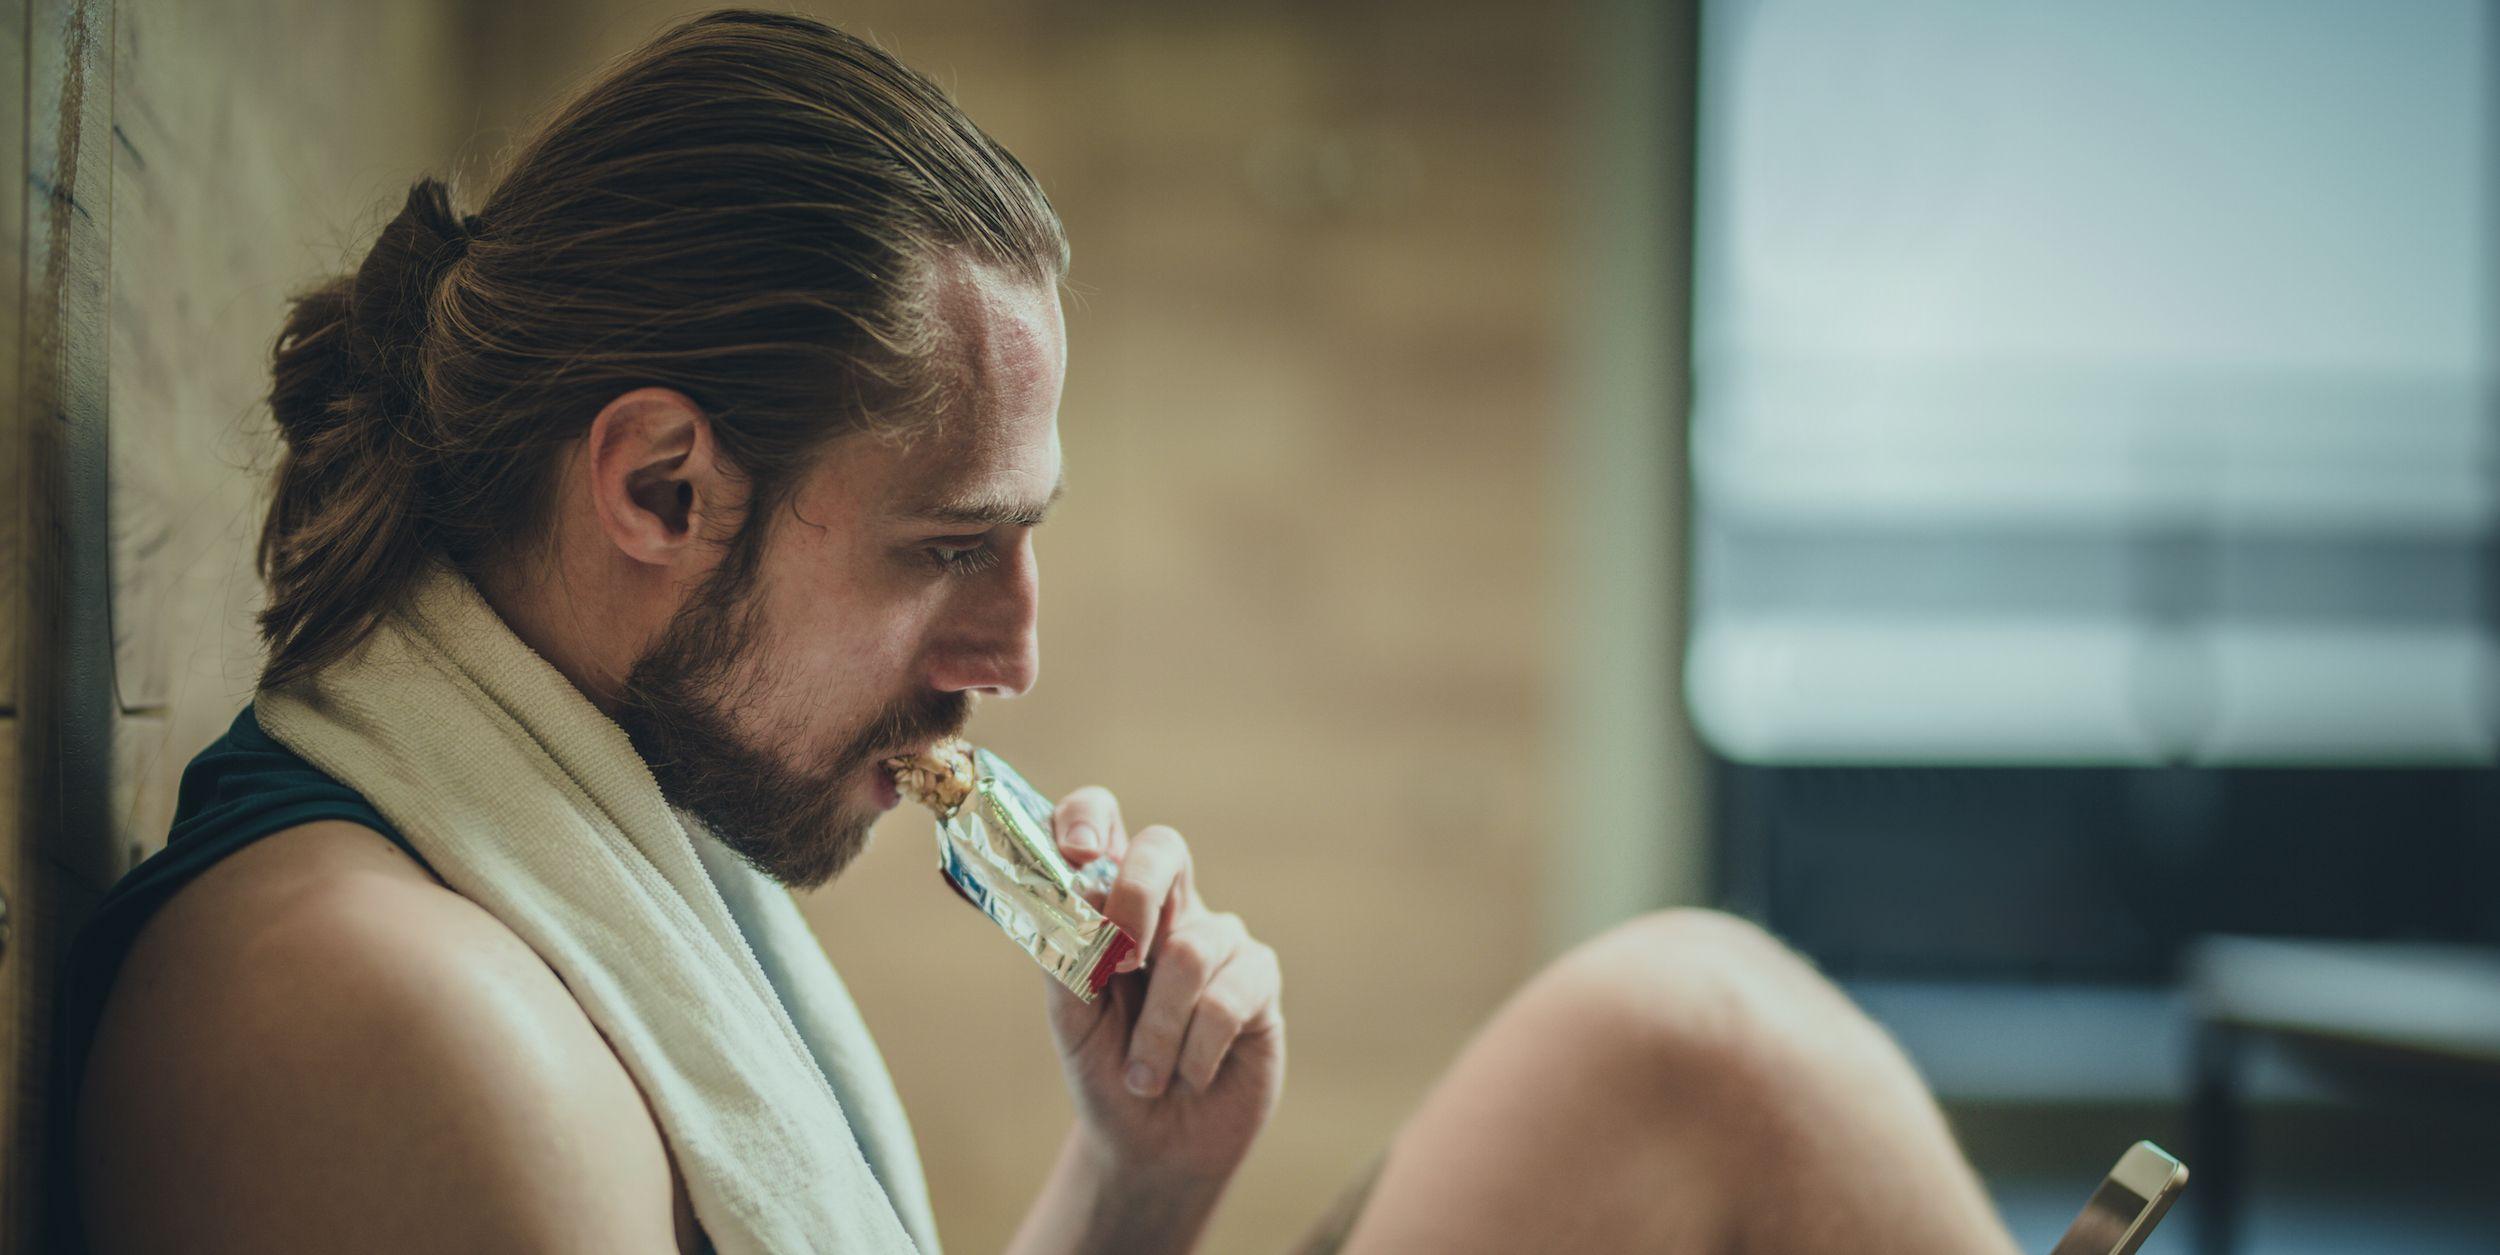 The 13 Best Protein Bars For Men